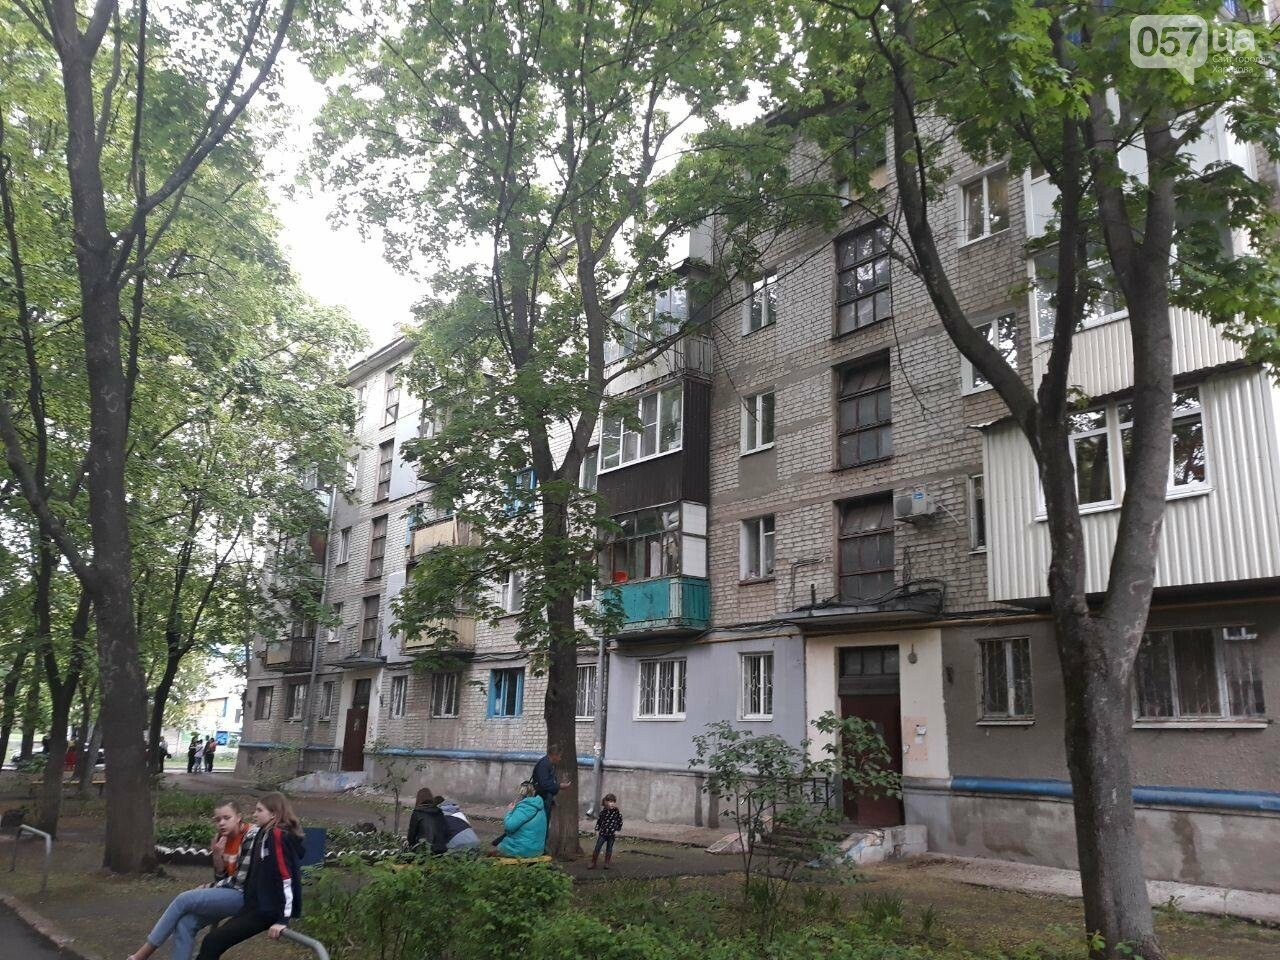 В Харькове силовики оцепили «пятиэтажку» и искали взрывчатку, - ФОТО, фото-10